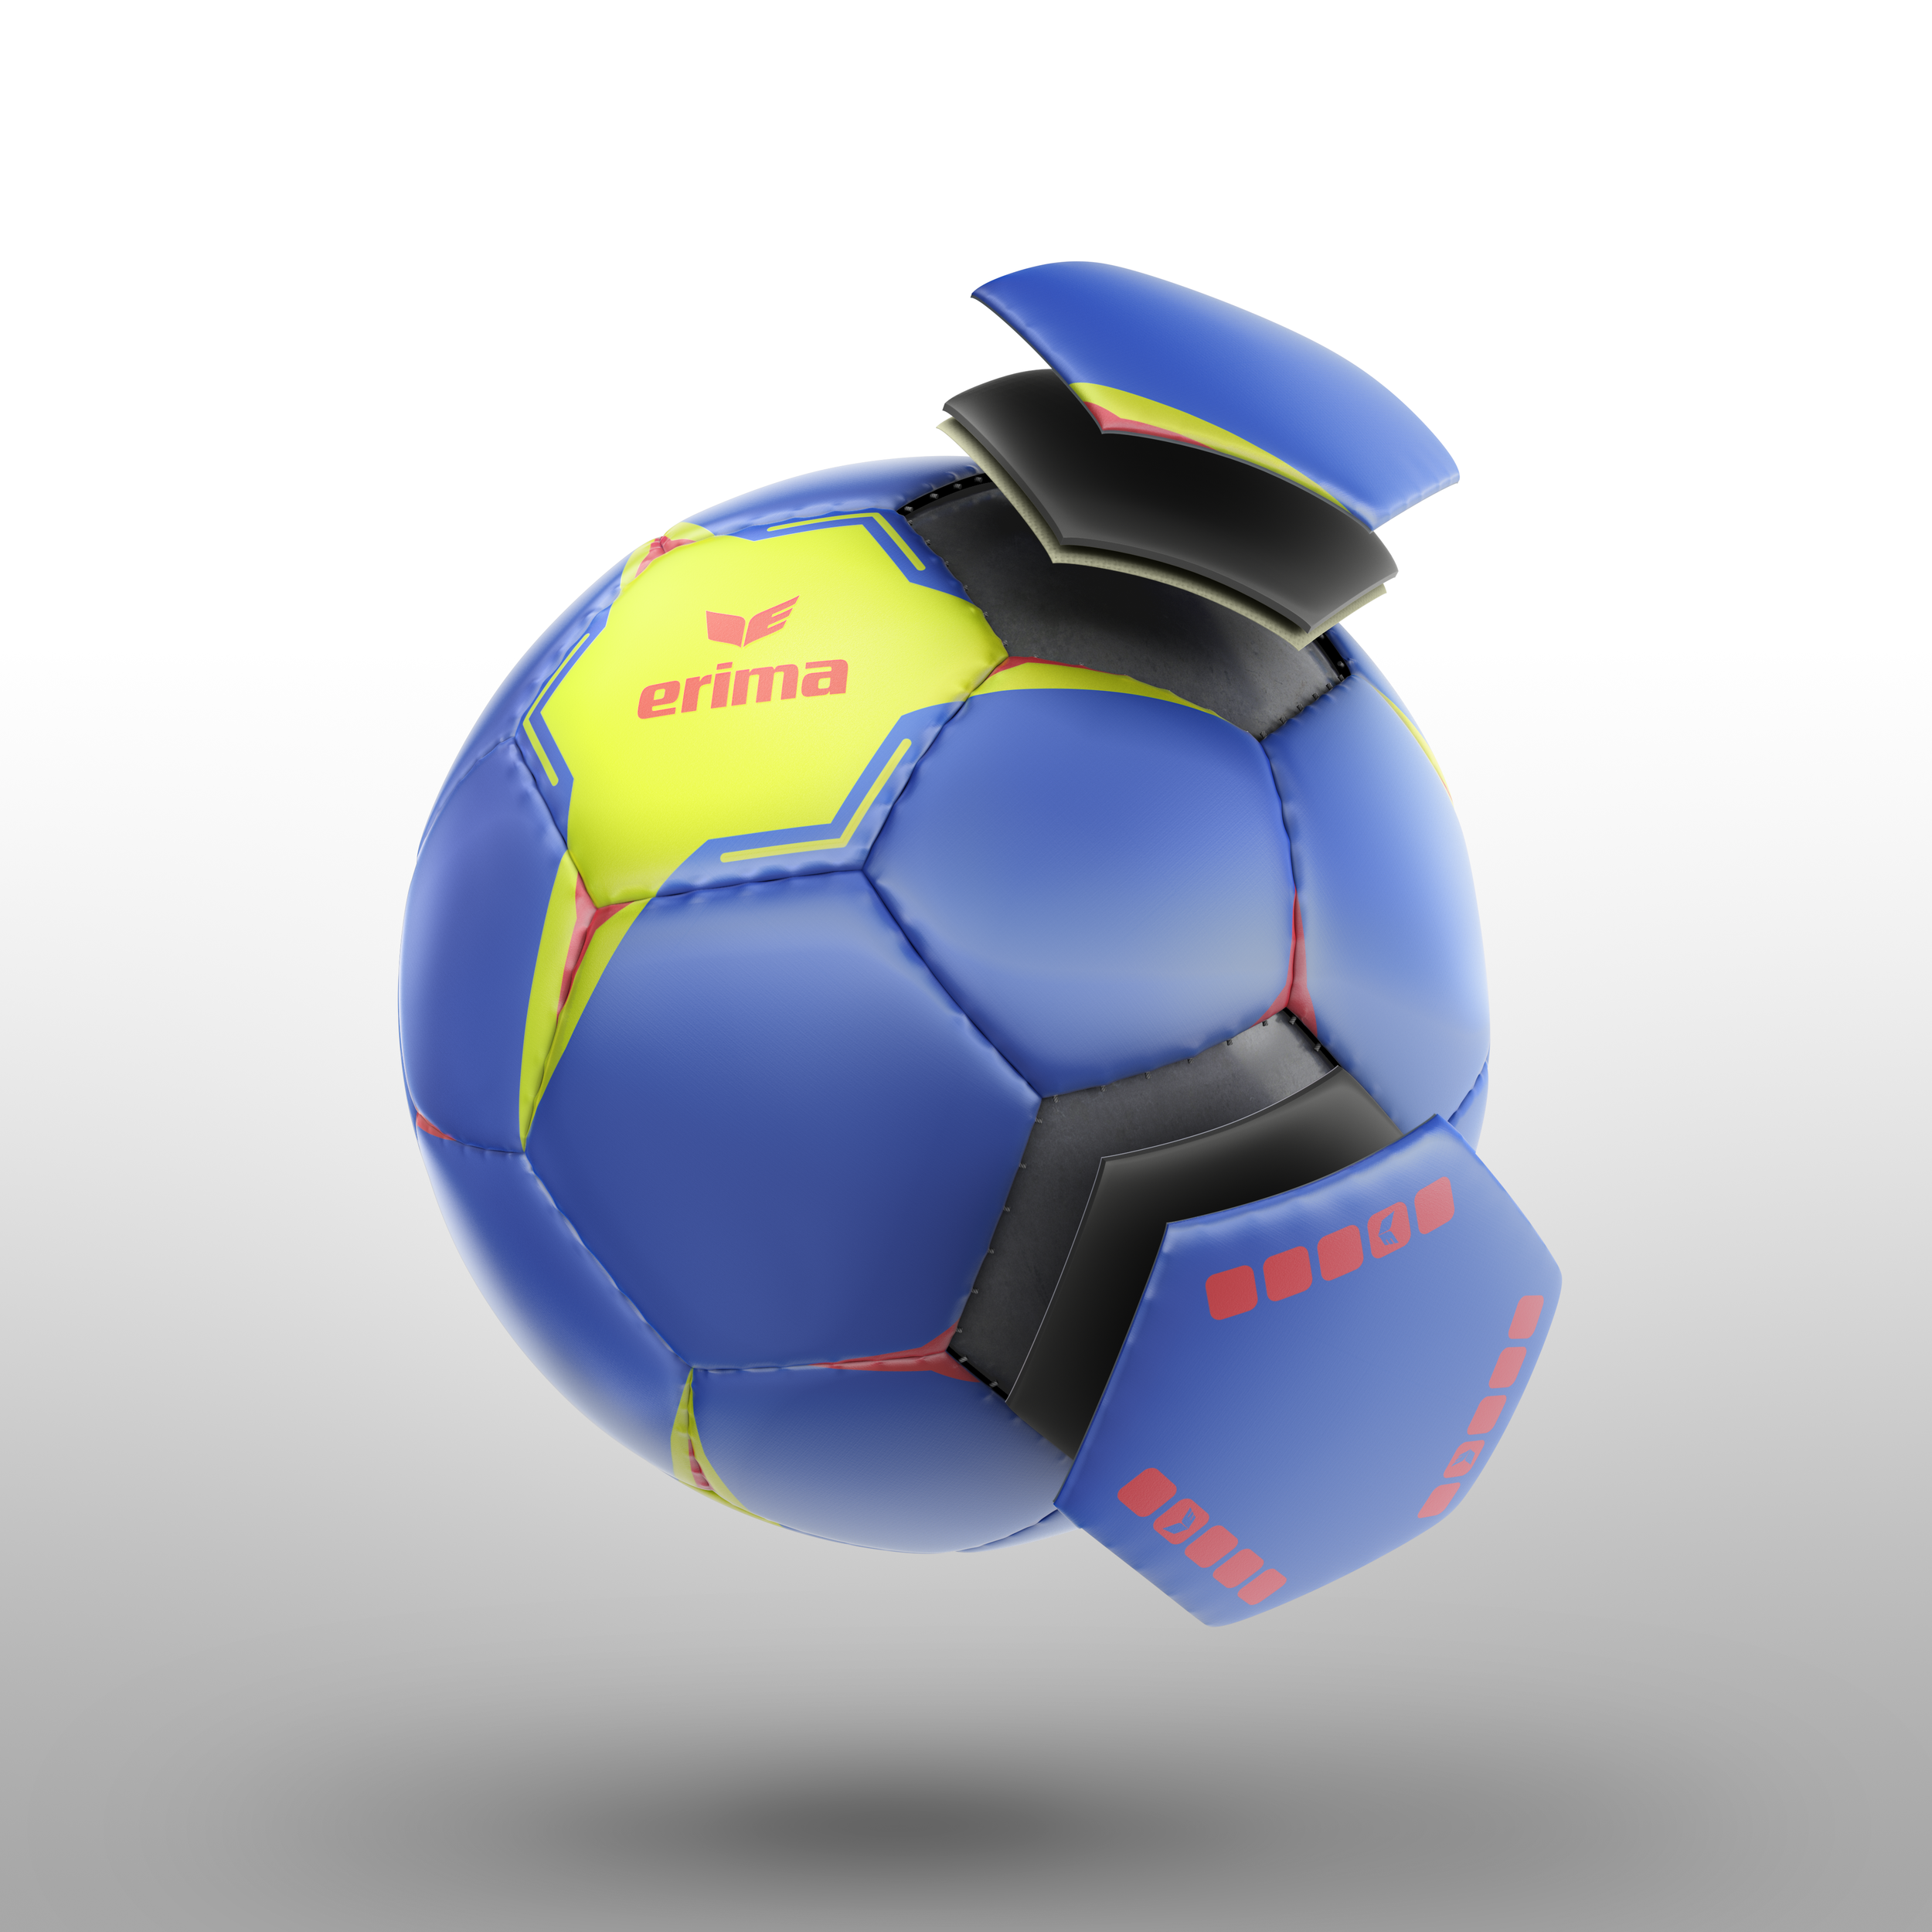 Handball_G13_offen_RGB.png